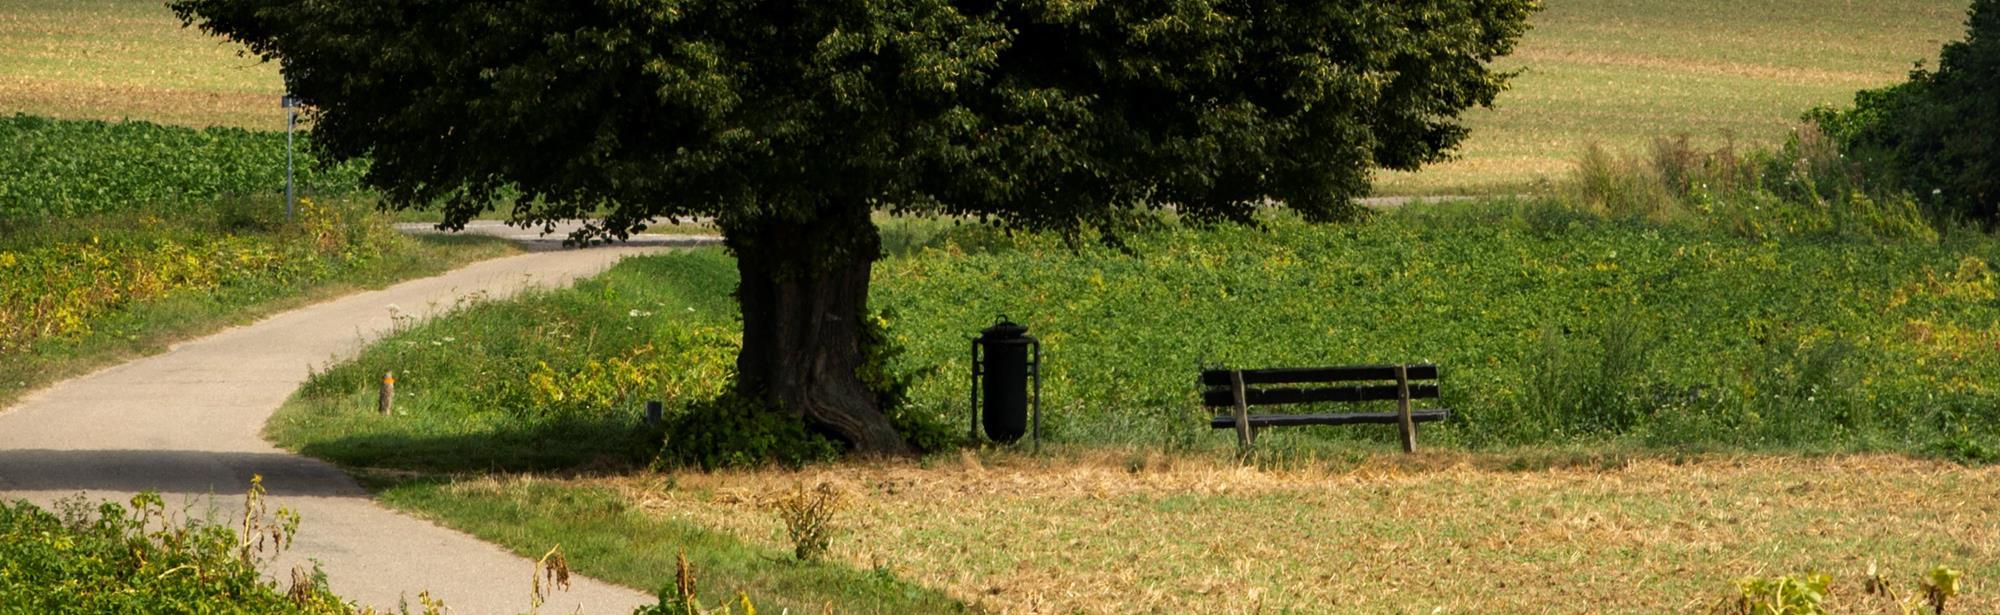 Fietsroute Geleenbeekdalroute